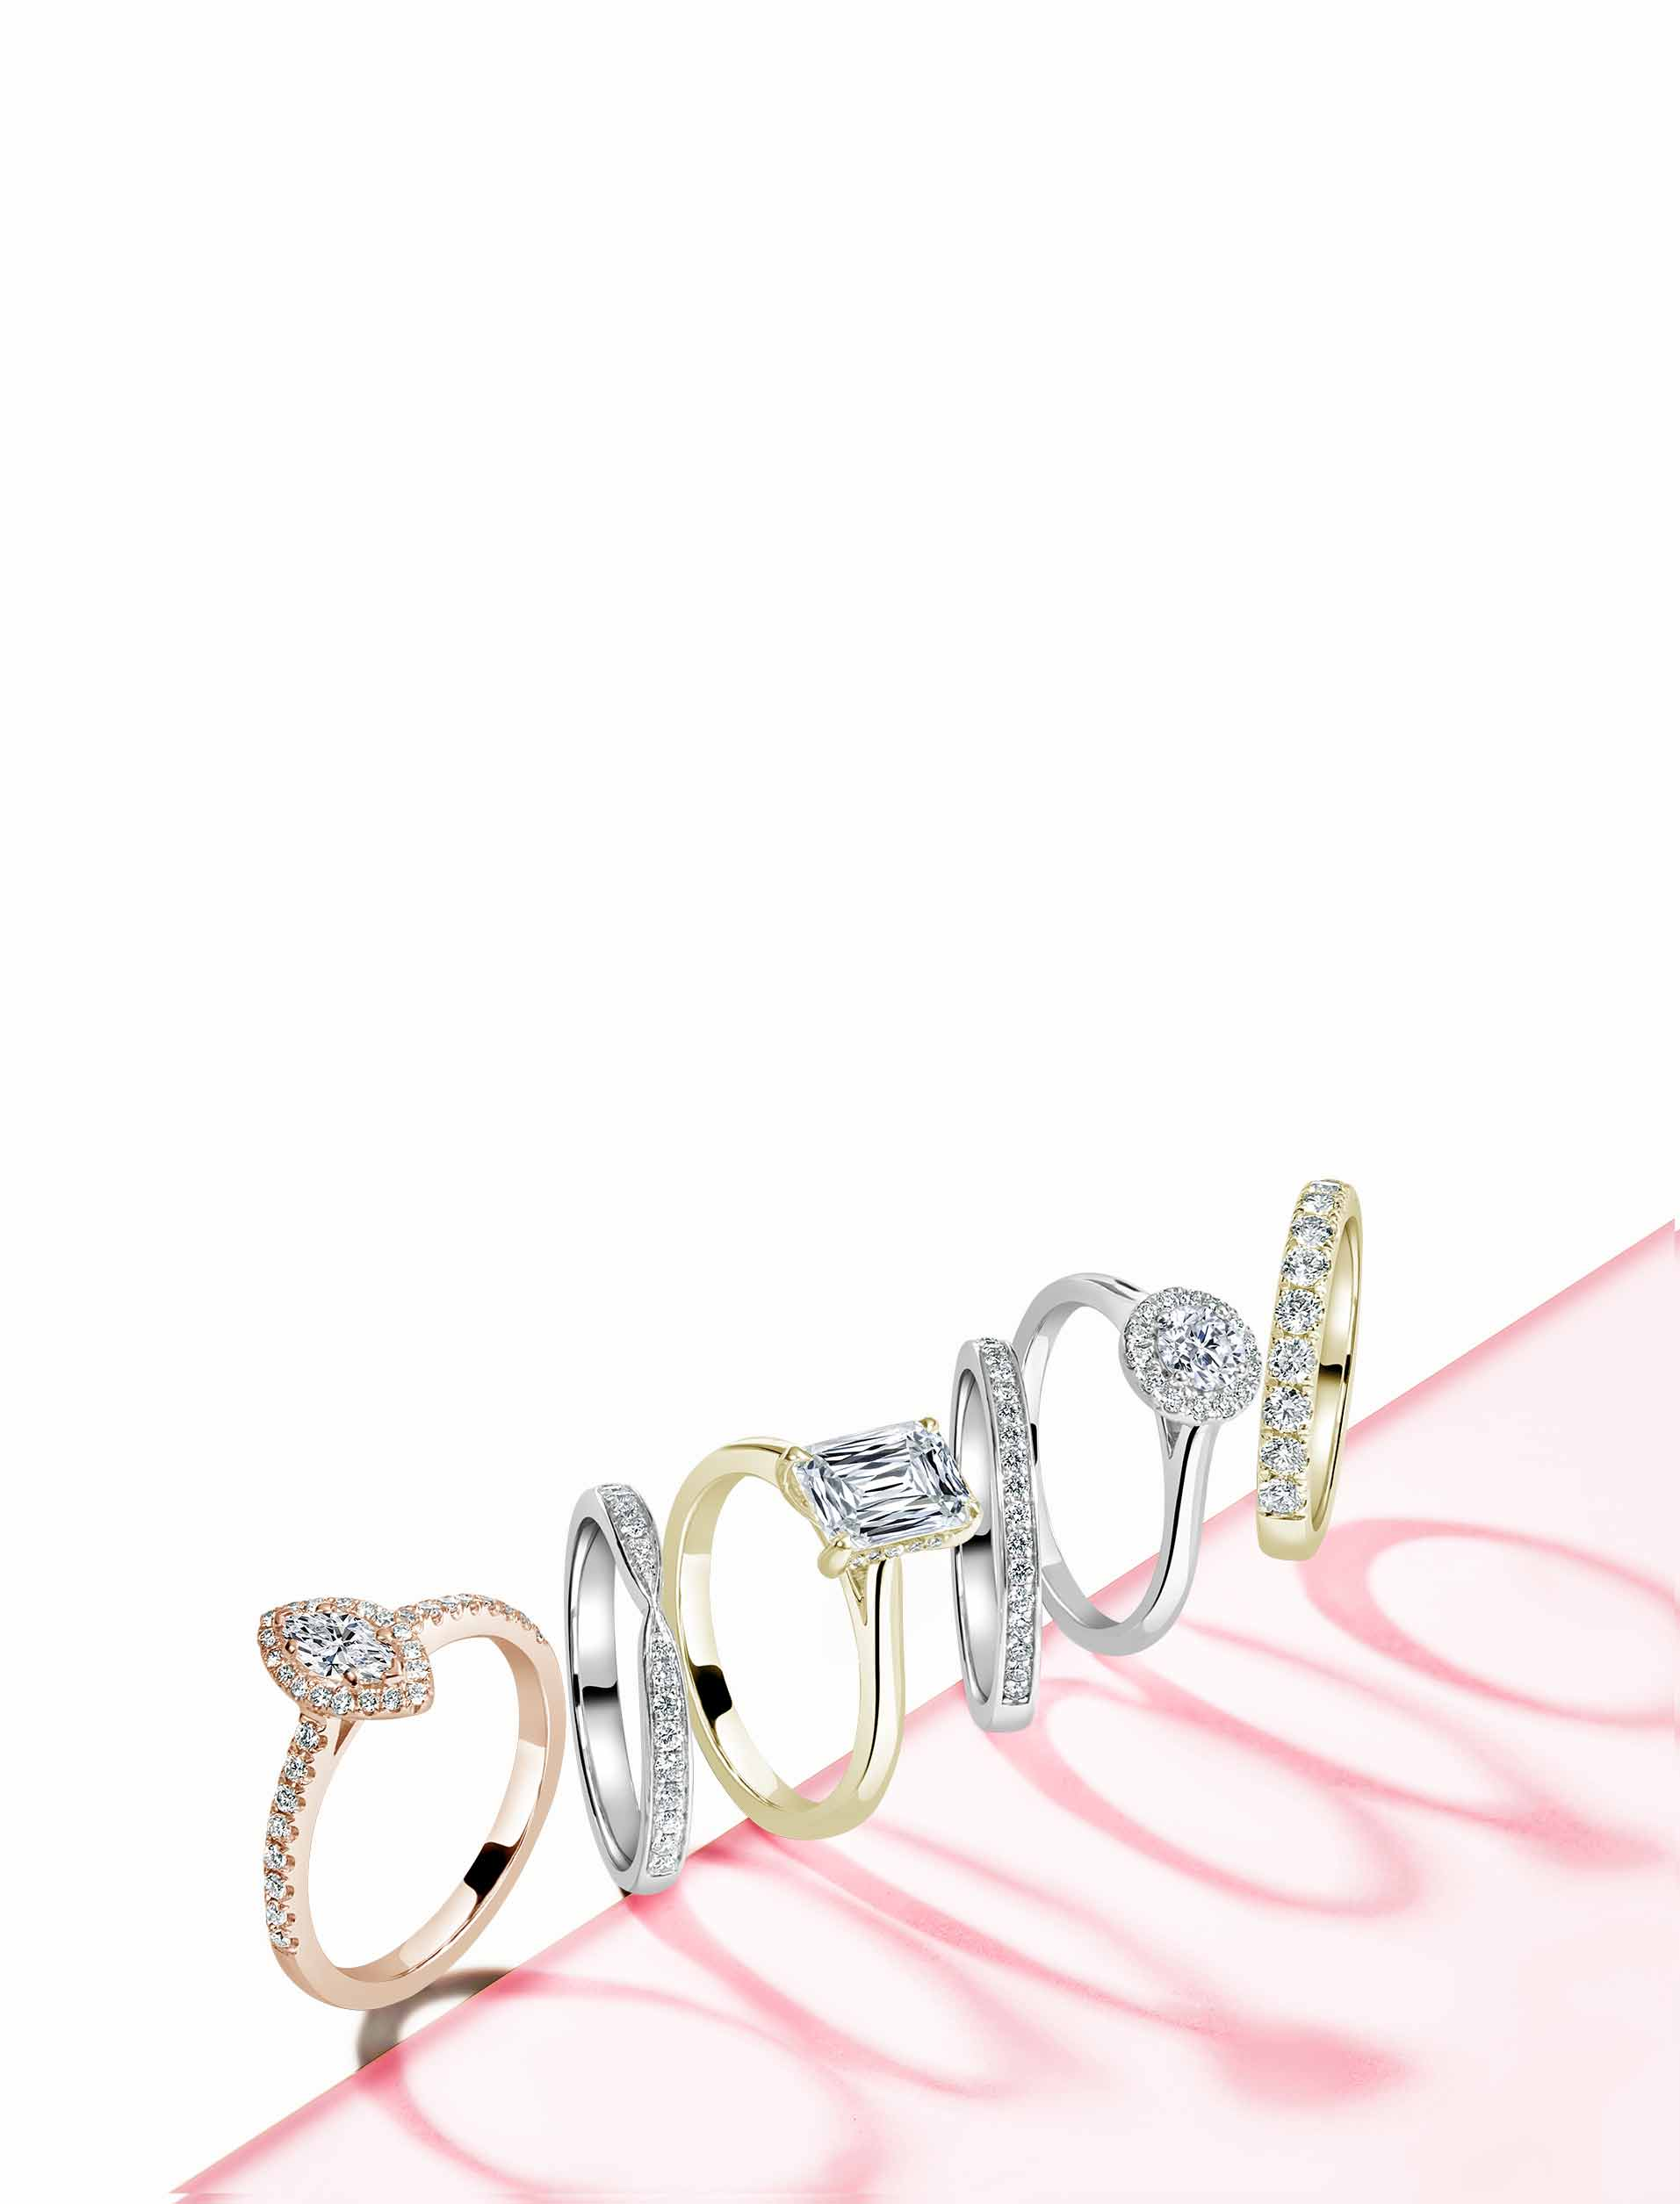 Round Brilliant Halo Engagement Rings